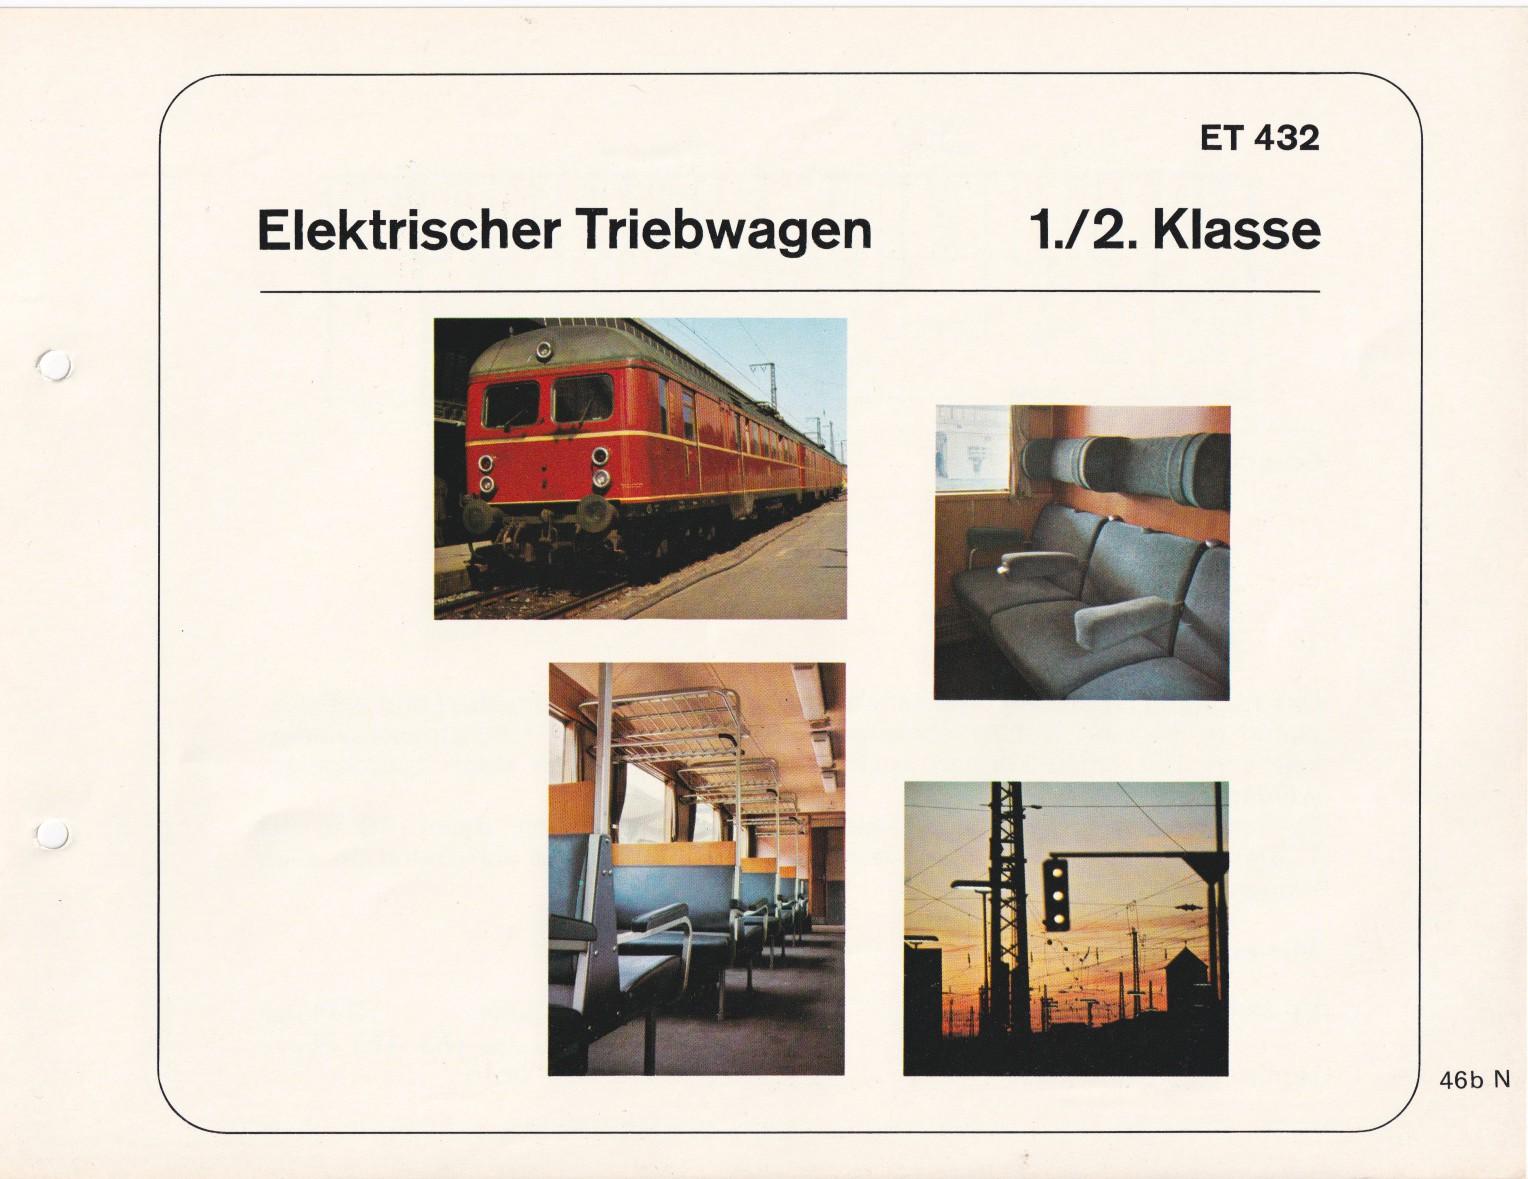 https://www.nullclub.de/hifo/Fahrzeuglexikon/Wagen46e.jpg